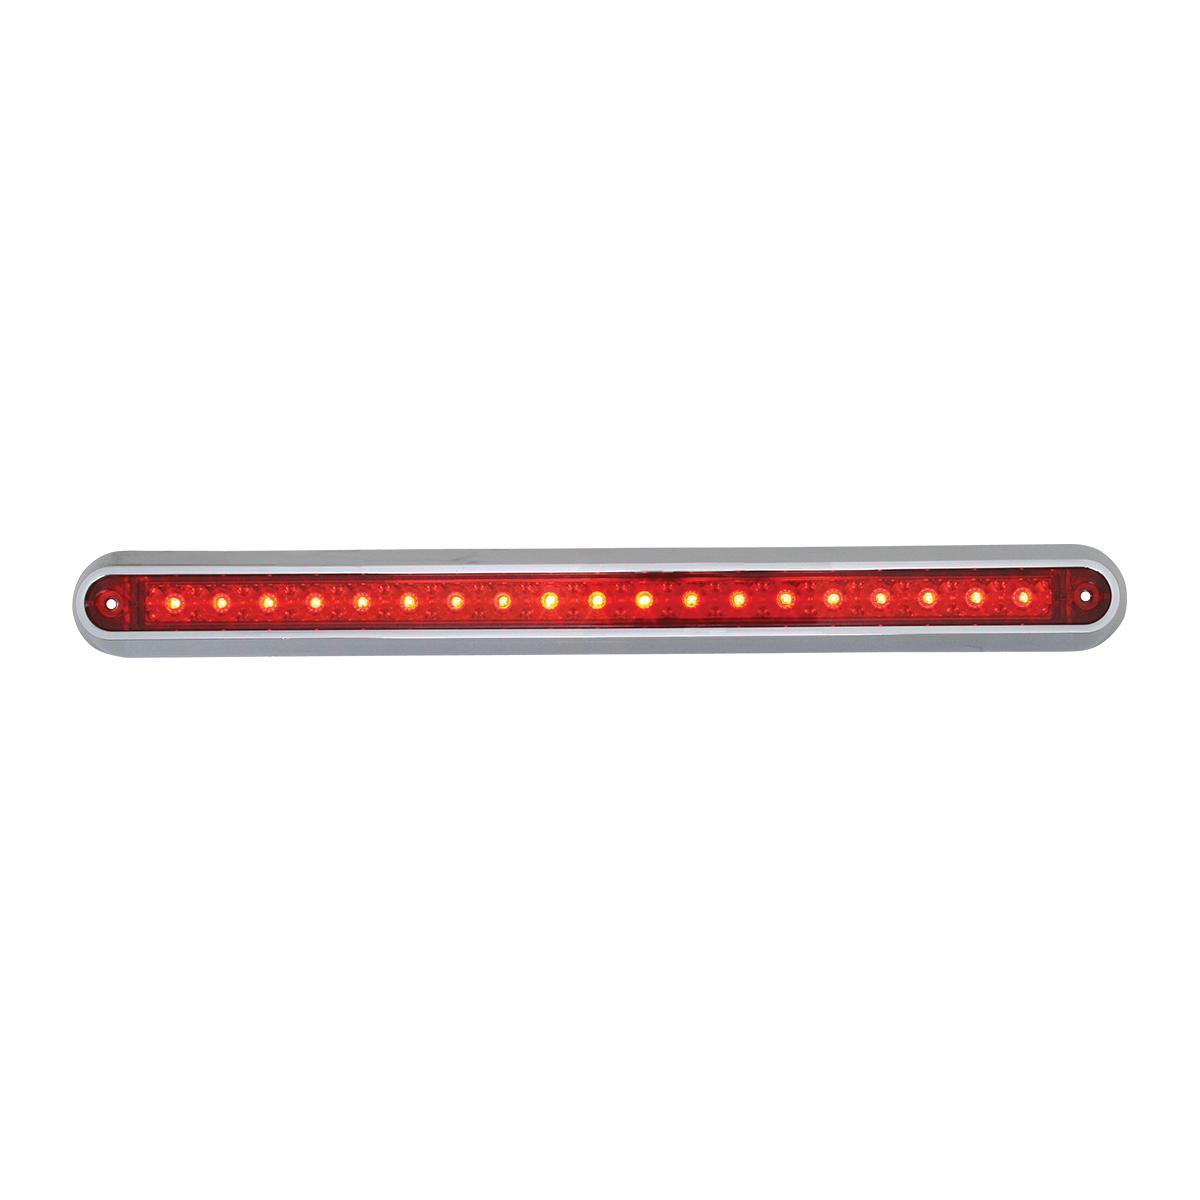 "76295 12"" Surface Mount Light Bar with Chrome Plastic Base"